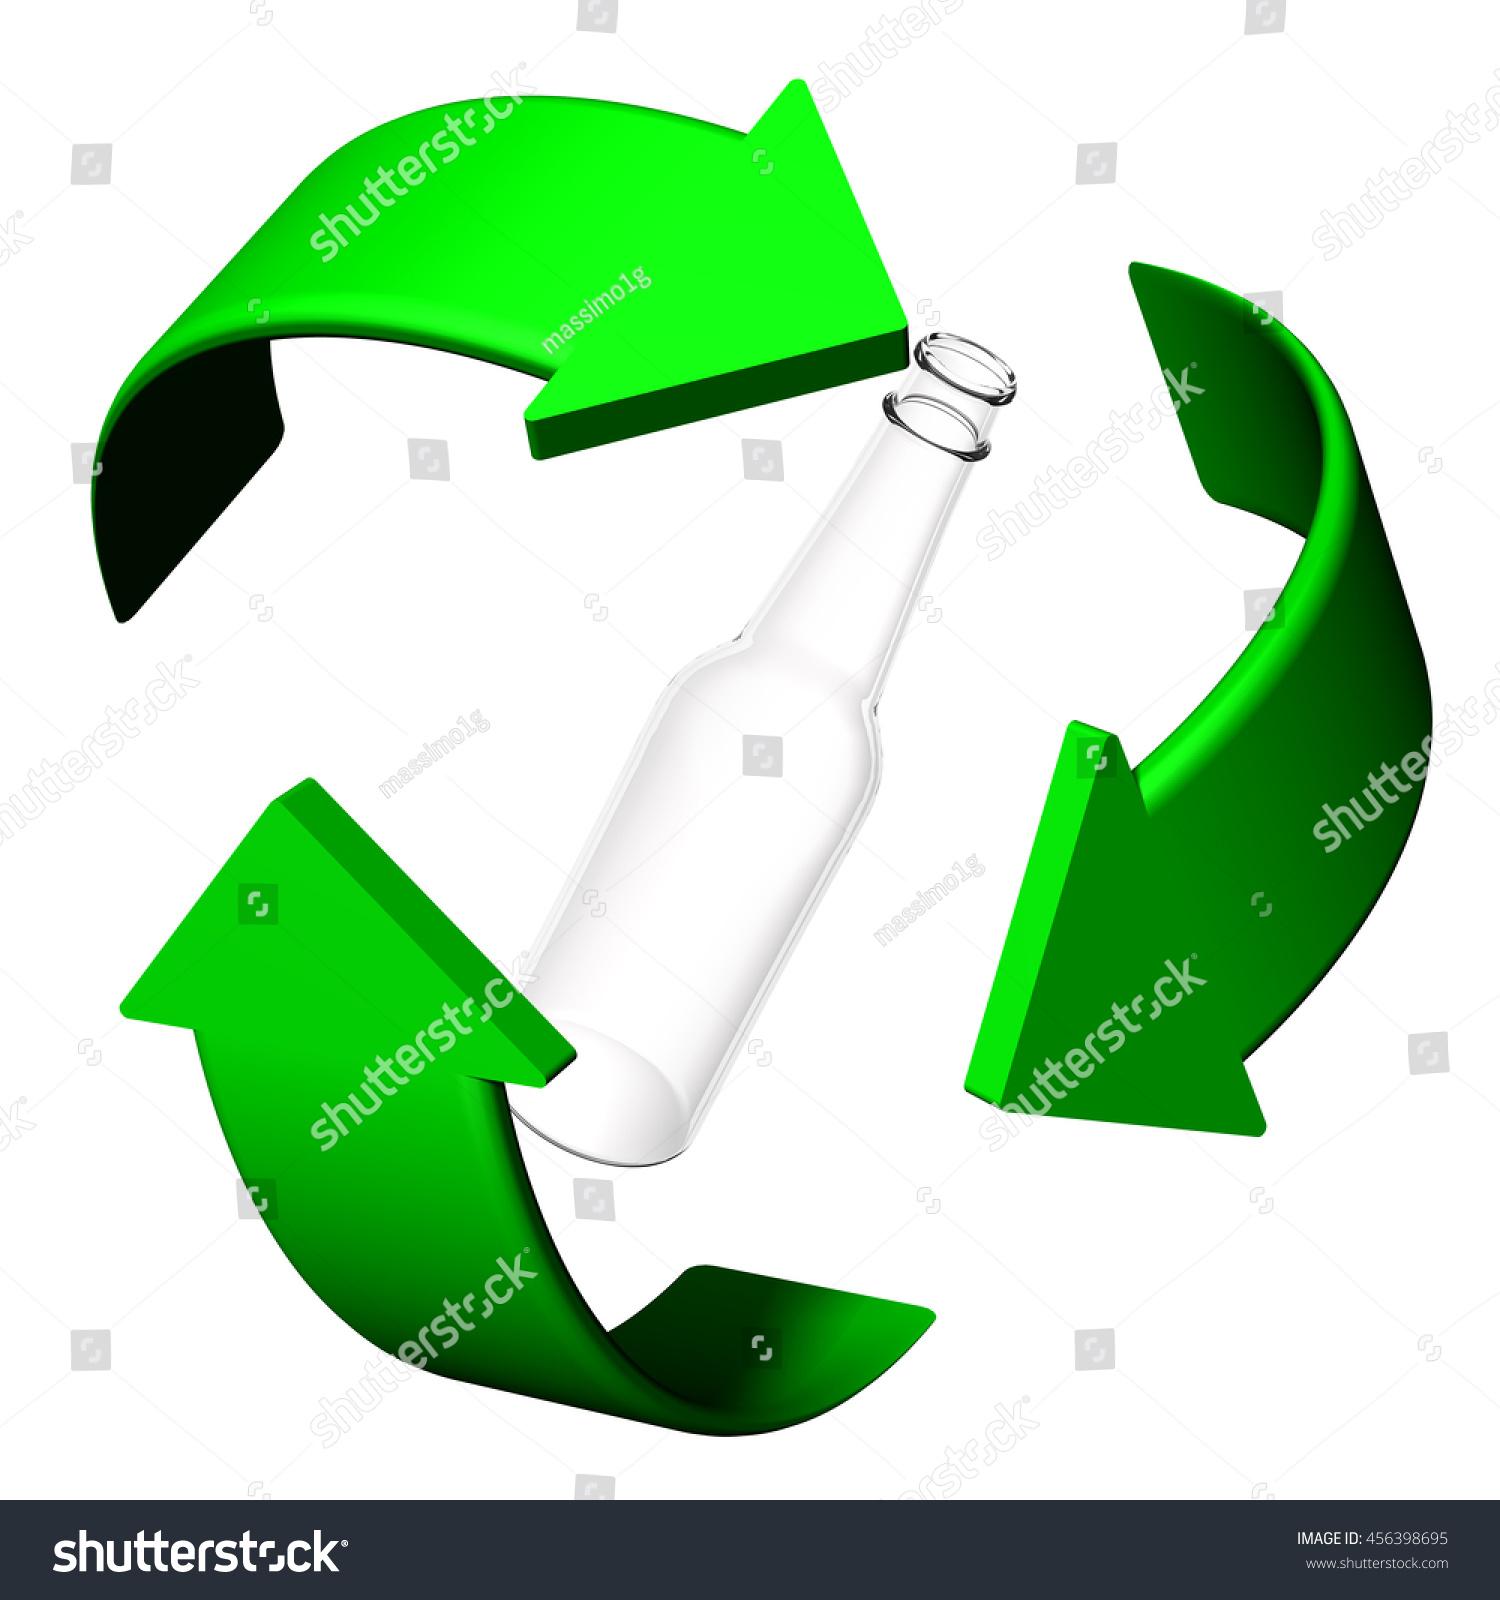 3 D Illustration Bottles Glass Recycling Symbol Stock Illustration